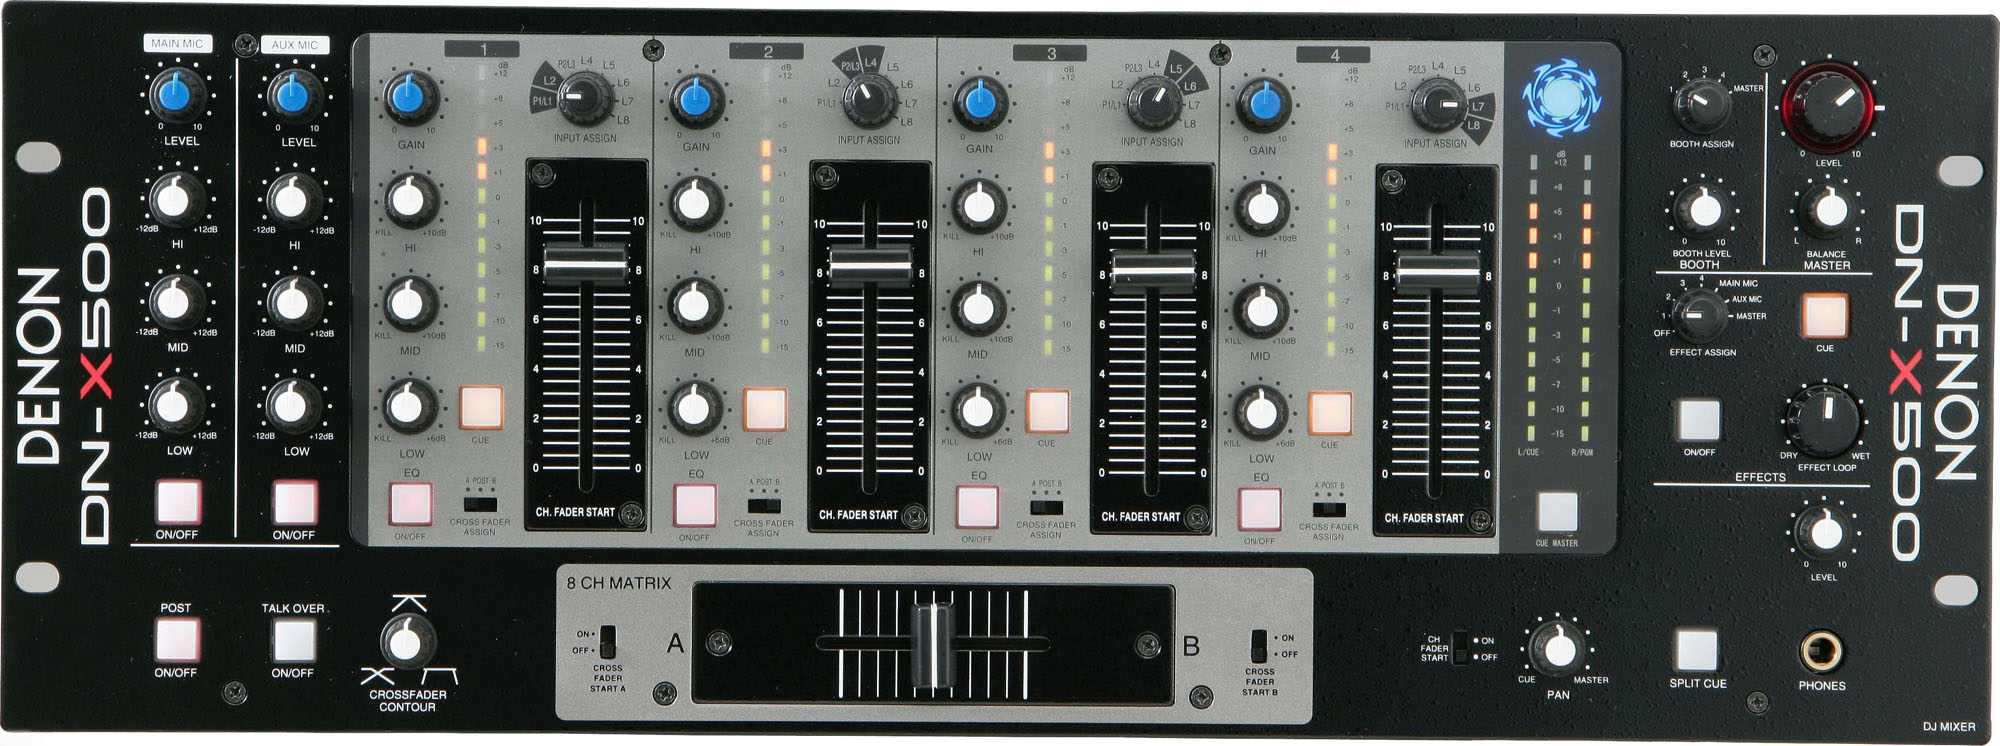 DJ-микшеры Denon, арт: 126787 - DJ-микшеры